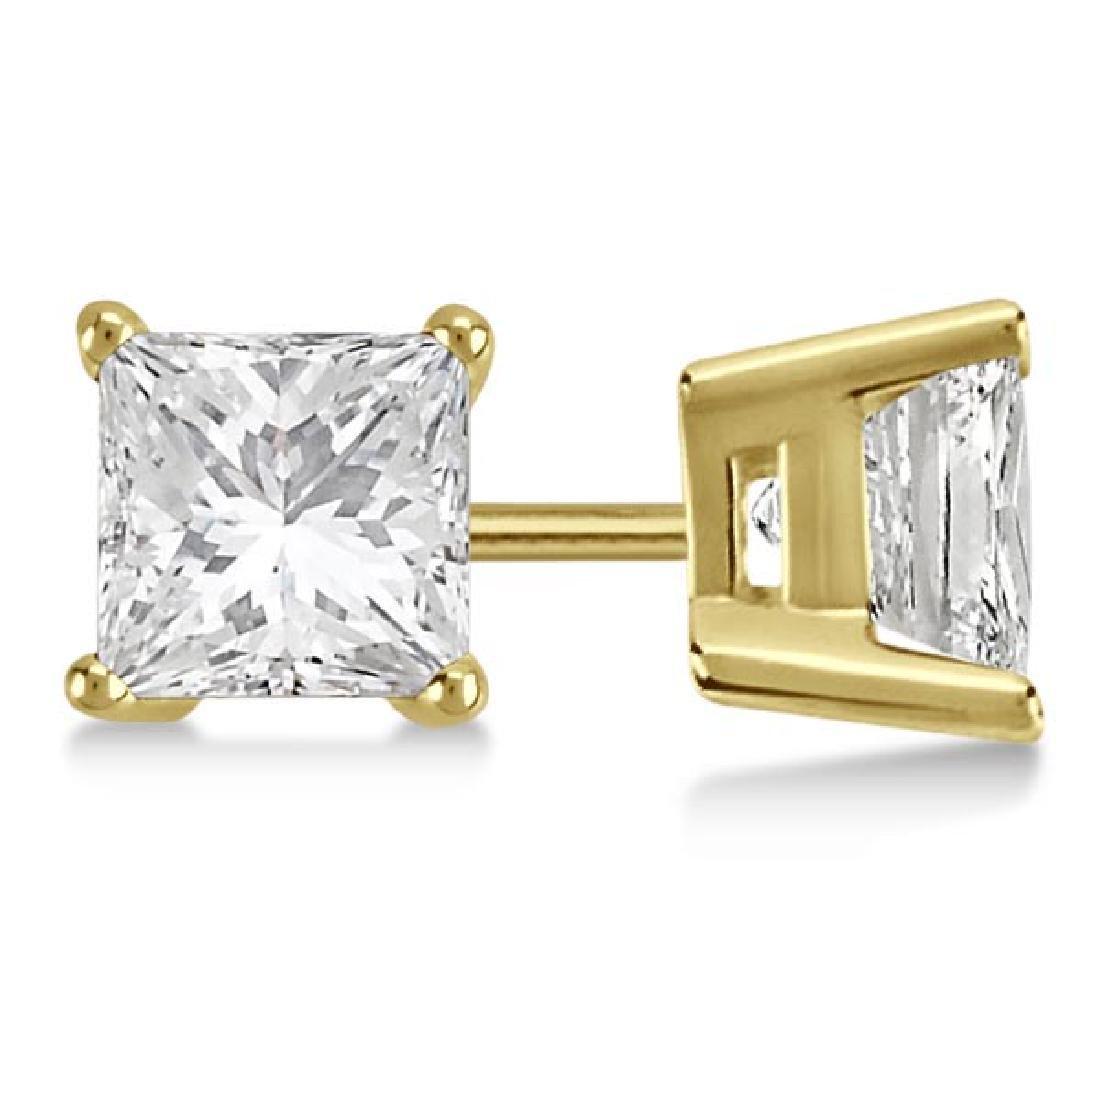 CERTIFIED 2 CTW PRINCESS E/SI1 DIAMOND SOLITAIRE EARRIN